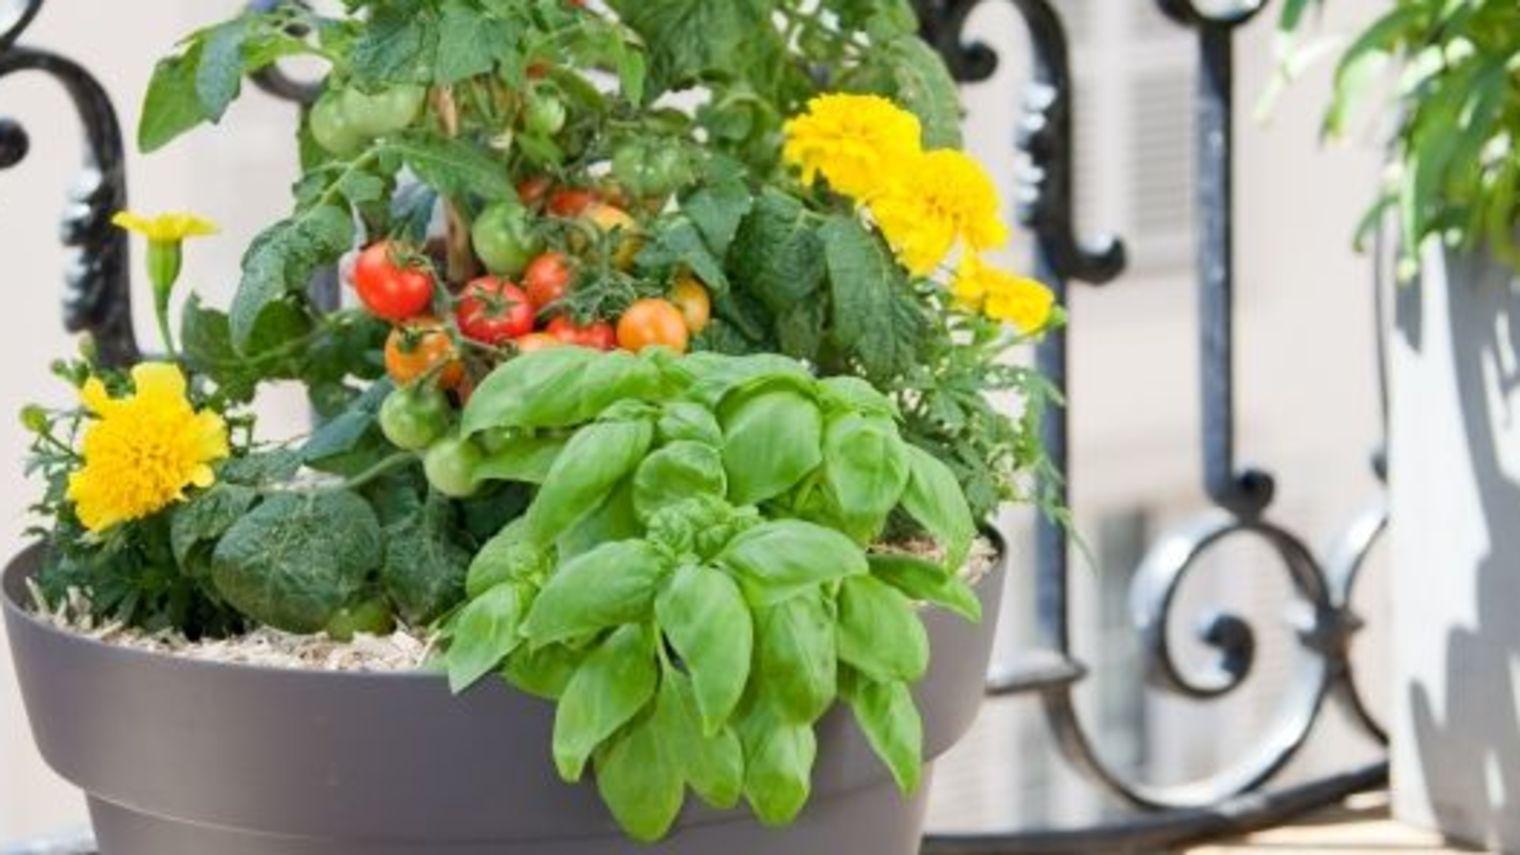 Planter Des Tomates En Pot planter des tomates cerise en pot | planter des tomates